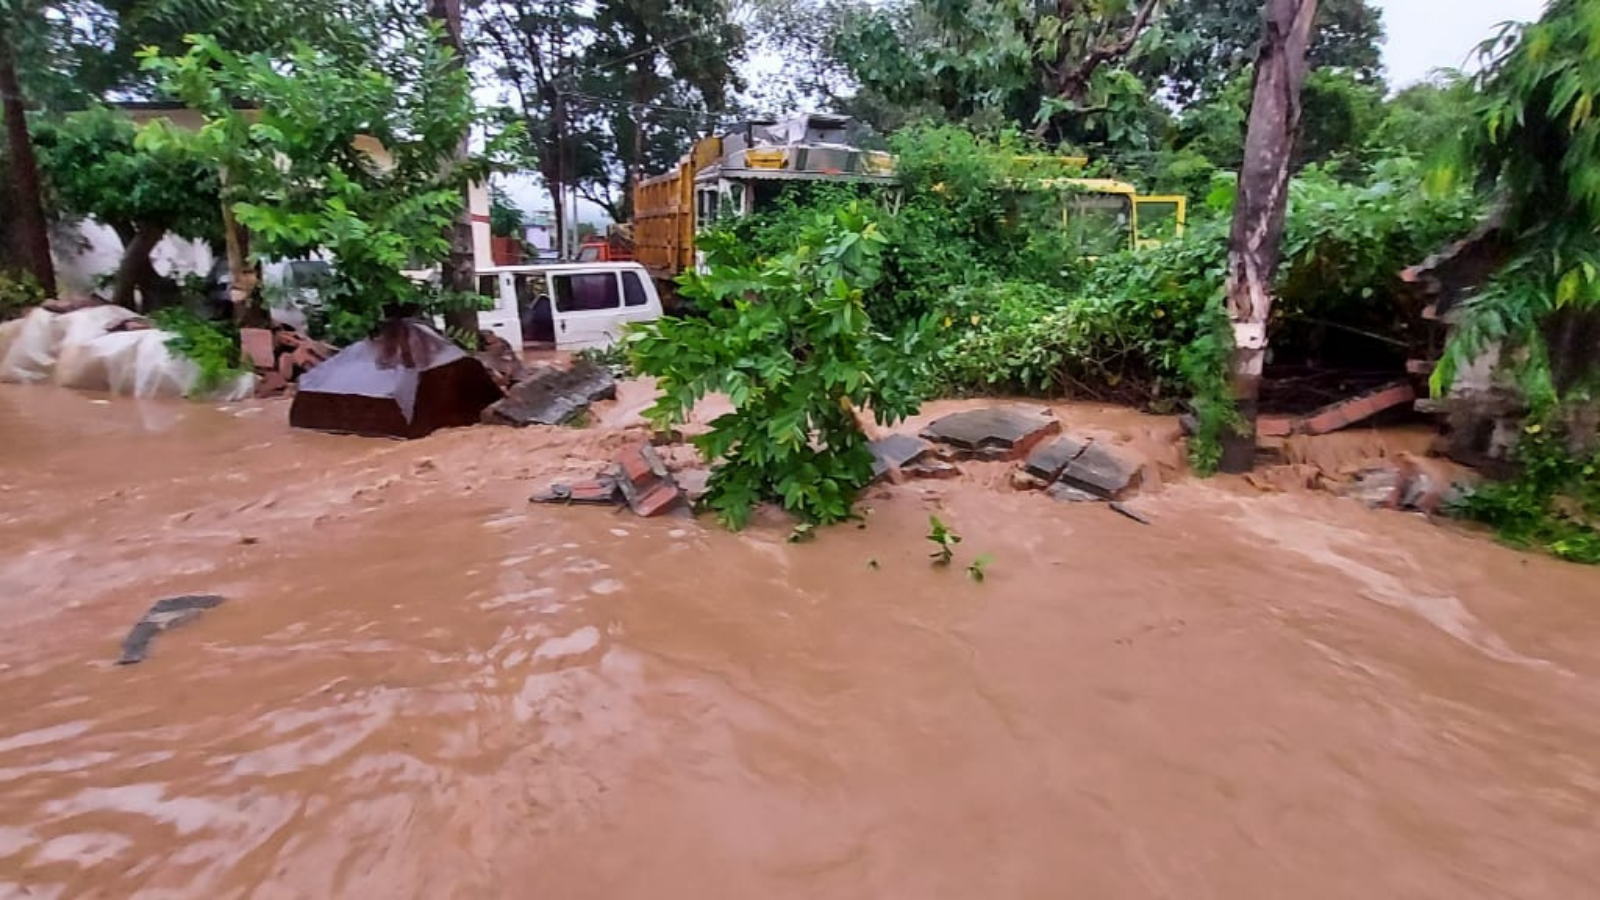 In pics: Cloudbursts, landslides wreak havoc in Uttarakhand